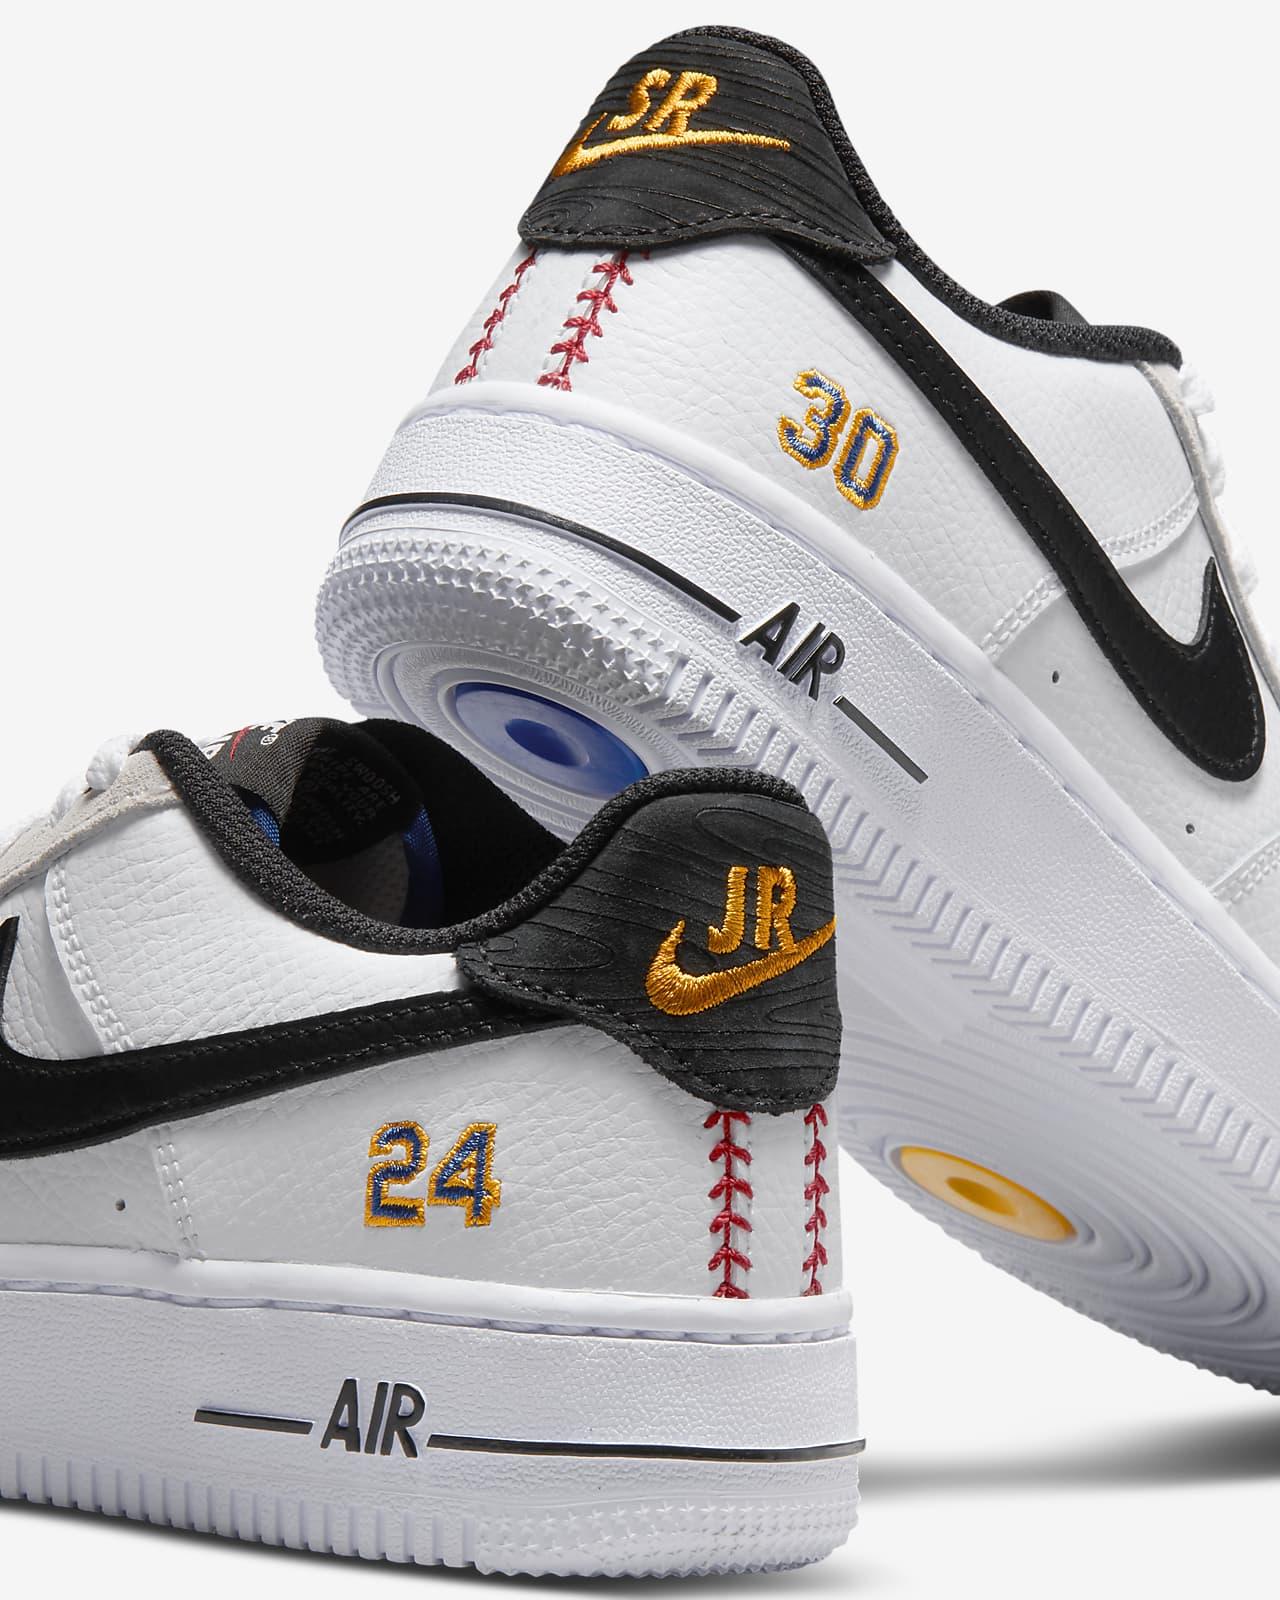 Nike Air Force 1 LV8 Big Kids' Shoe